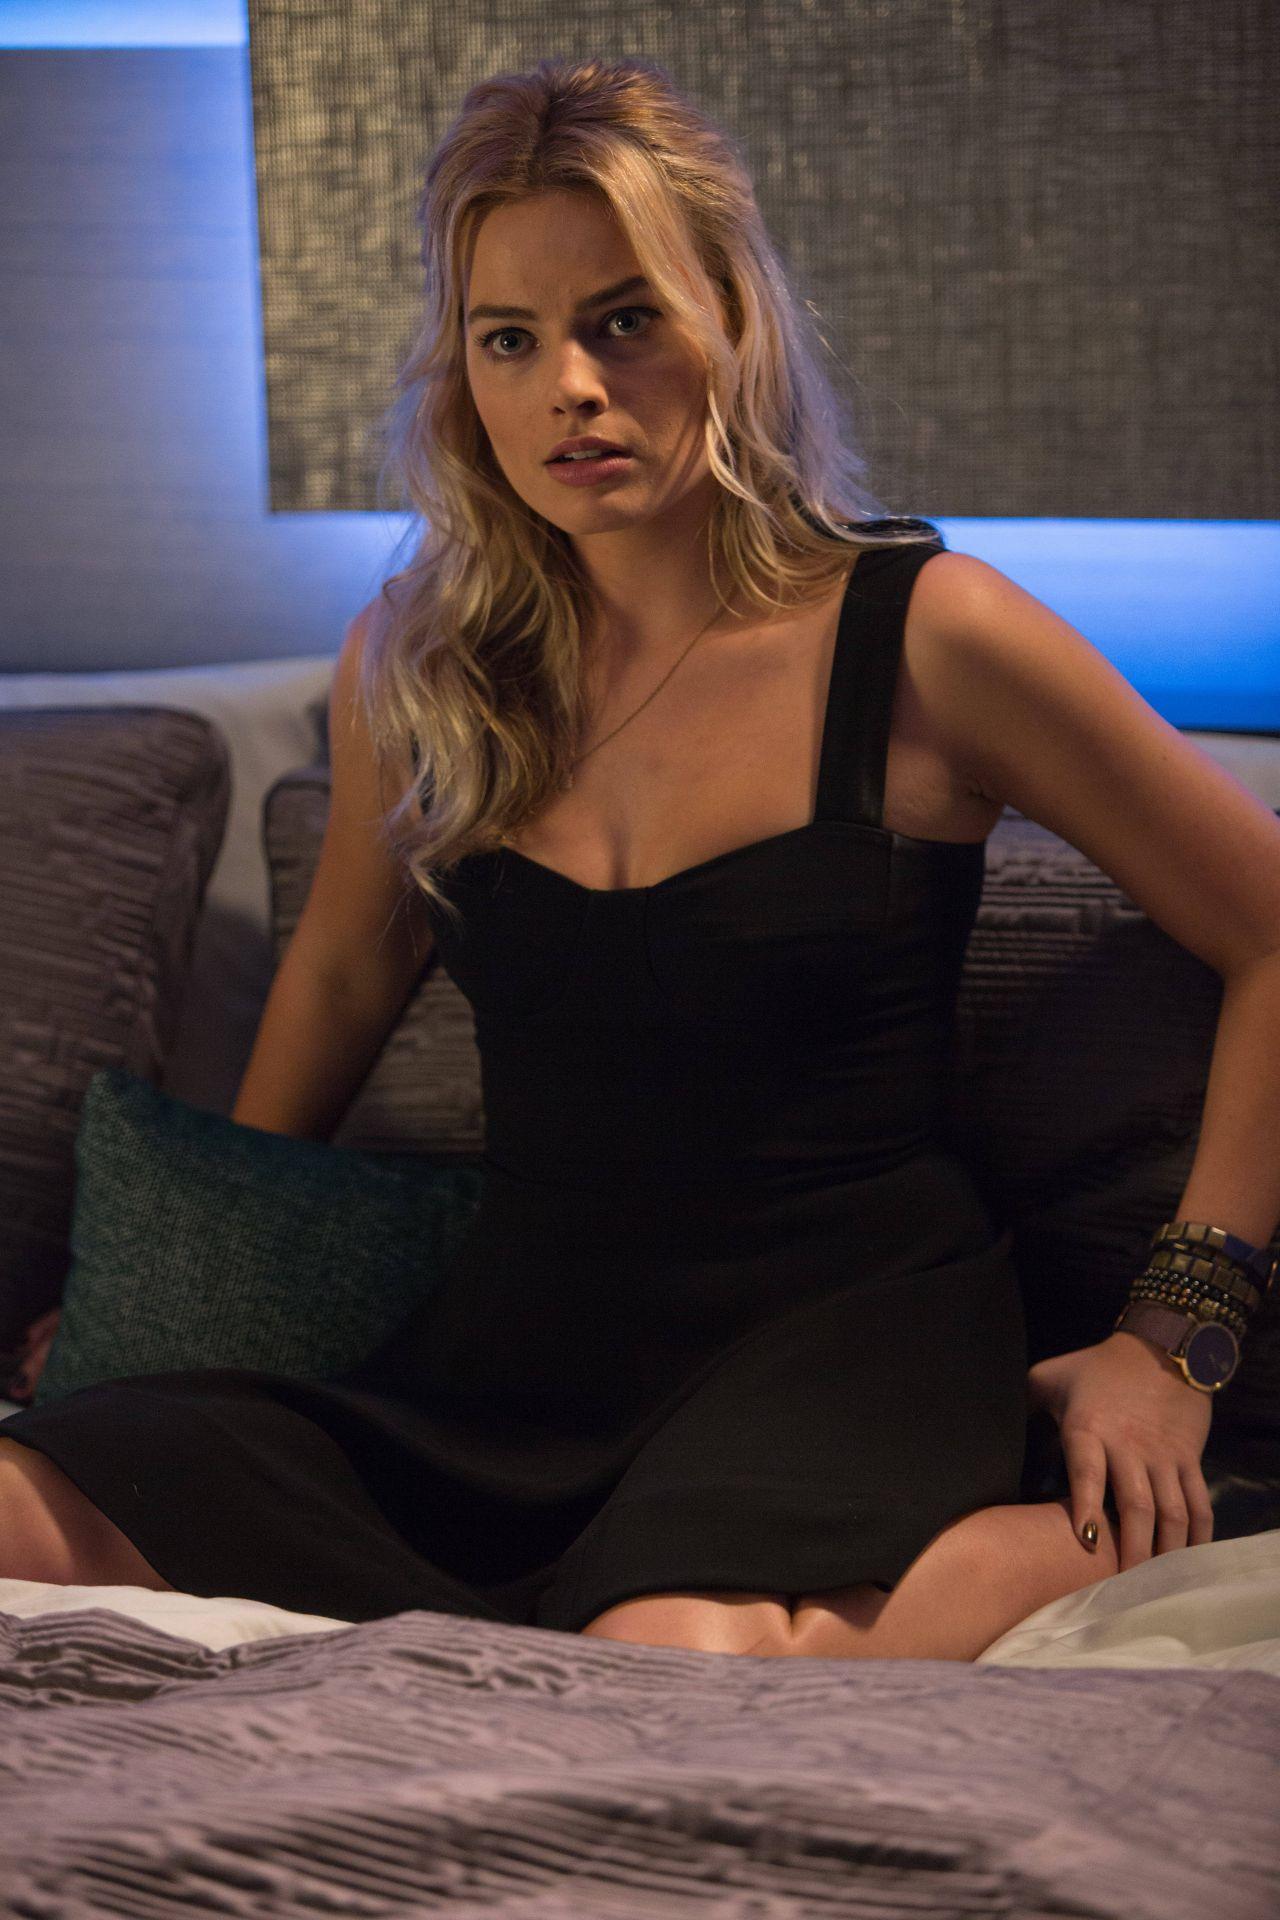 Margot Robbie – 'Focus' Movie Photos